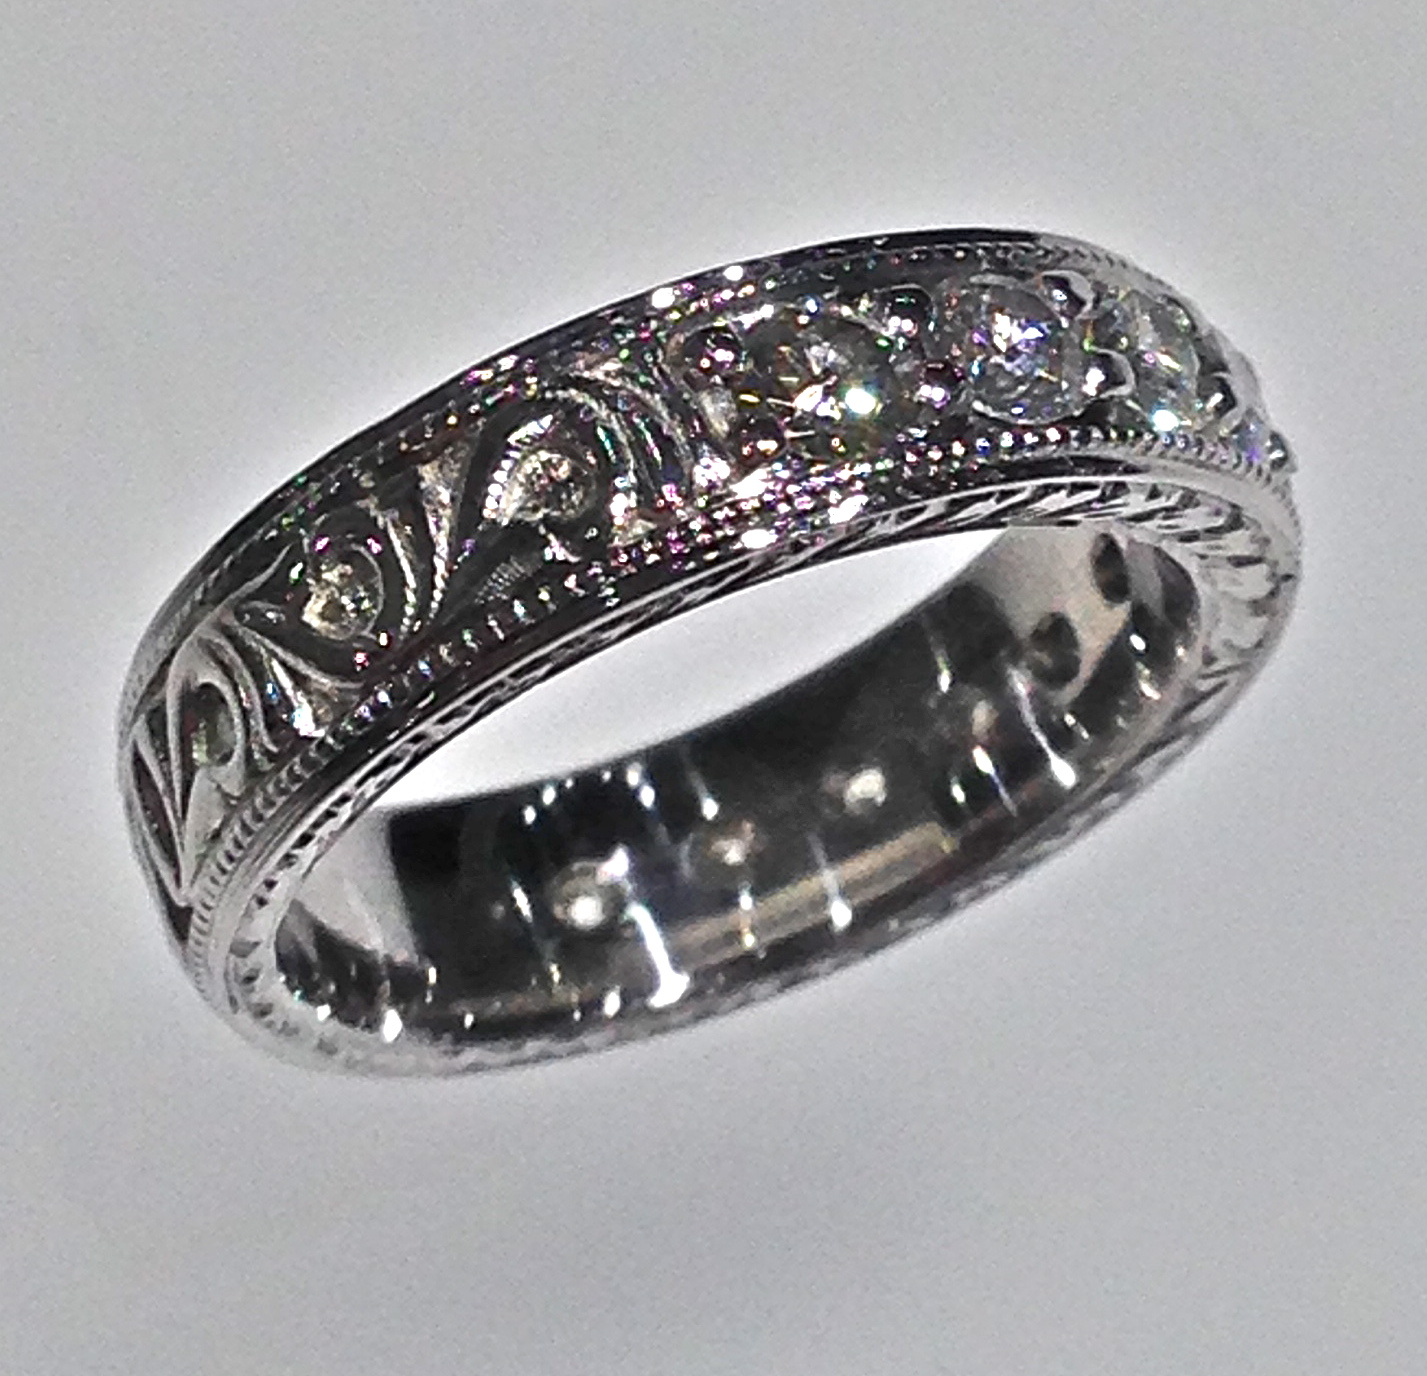 wedding bands vintage filigree wedding bands Craft Revival Jewelers diamond wedding band antique wedding band engraved band